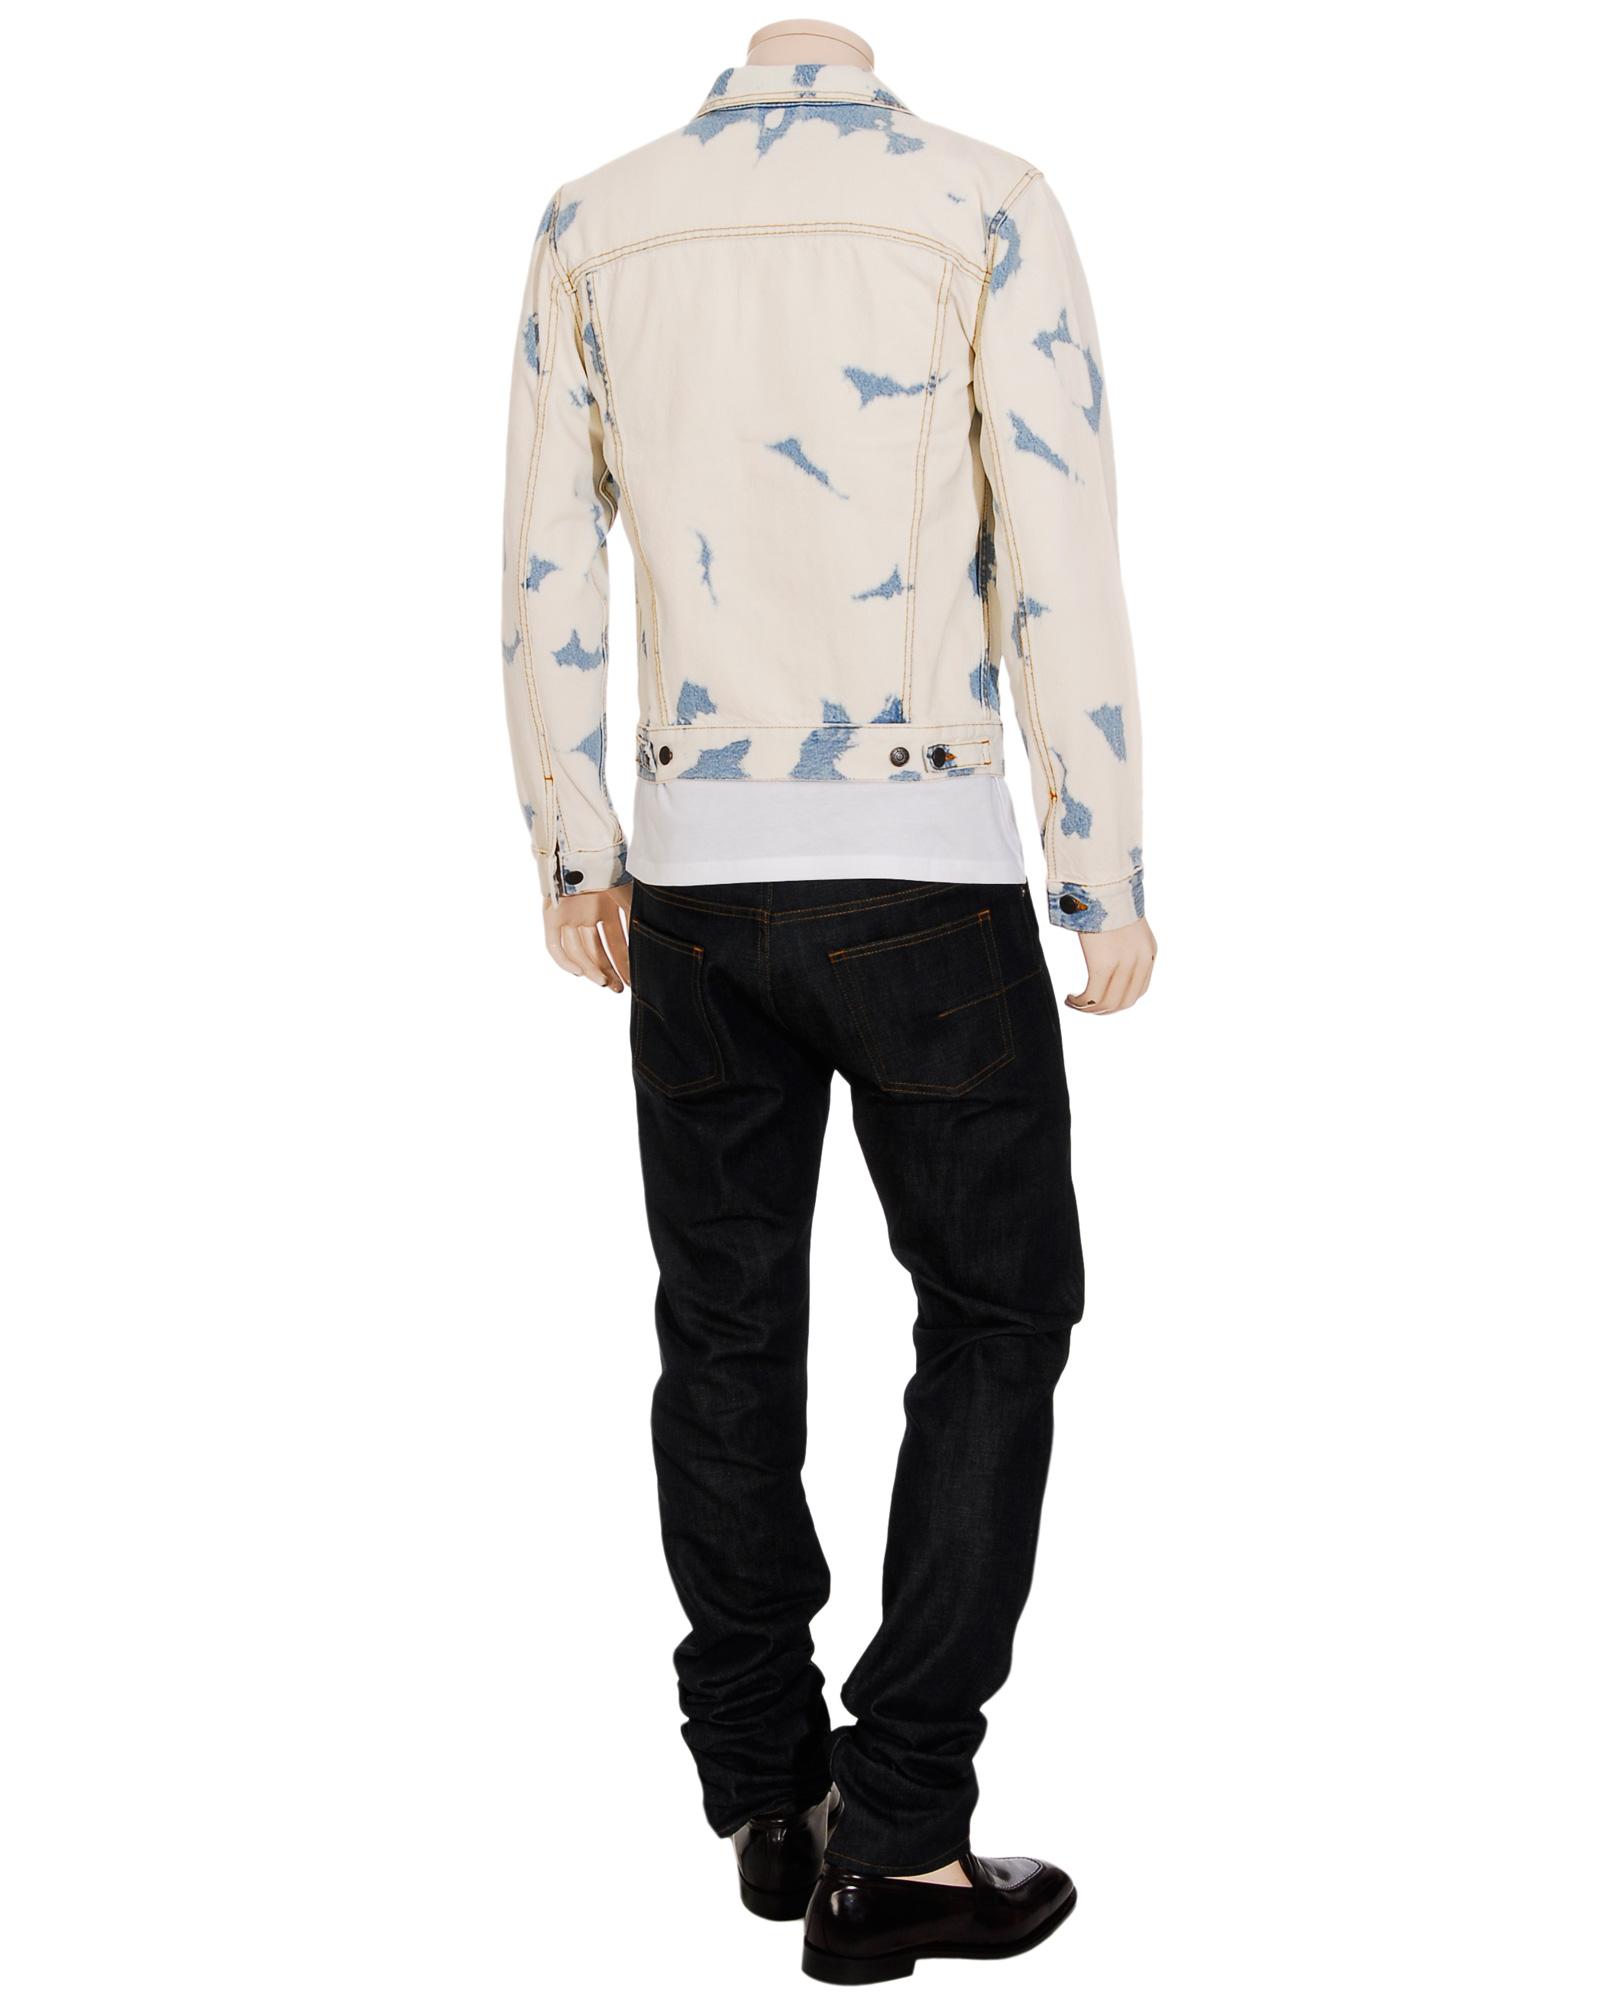 Dries Van Noten Bleach Splattered Denim Jacket in Blue for Men